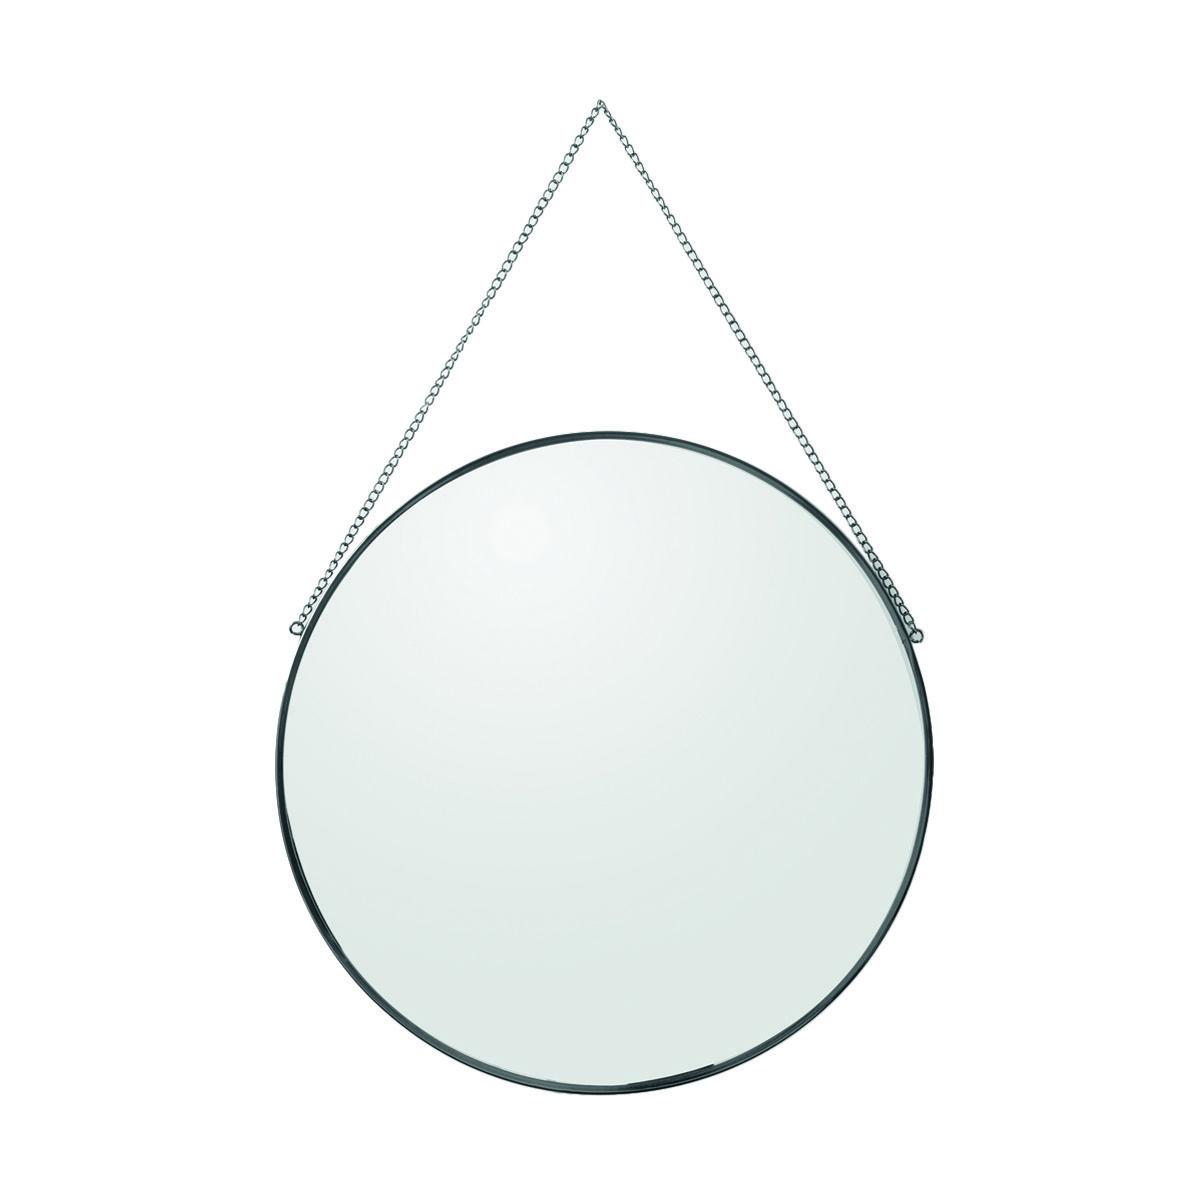 Grey mirror kmart house ideas pinterest gray and house